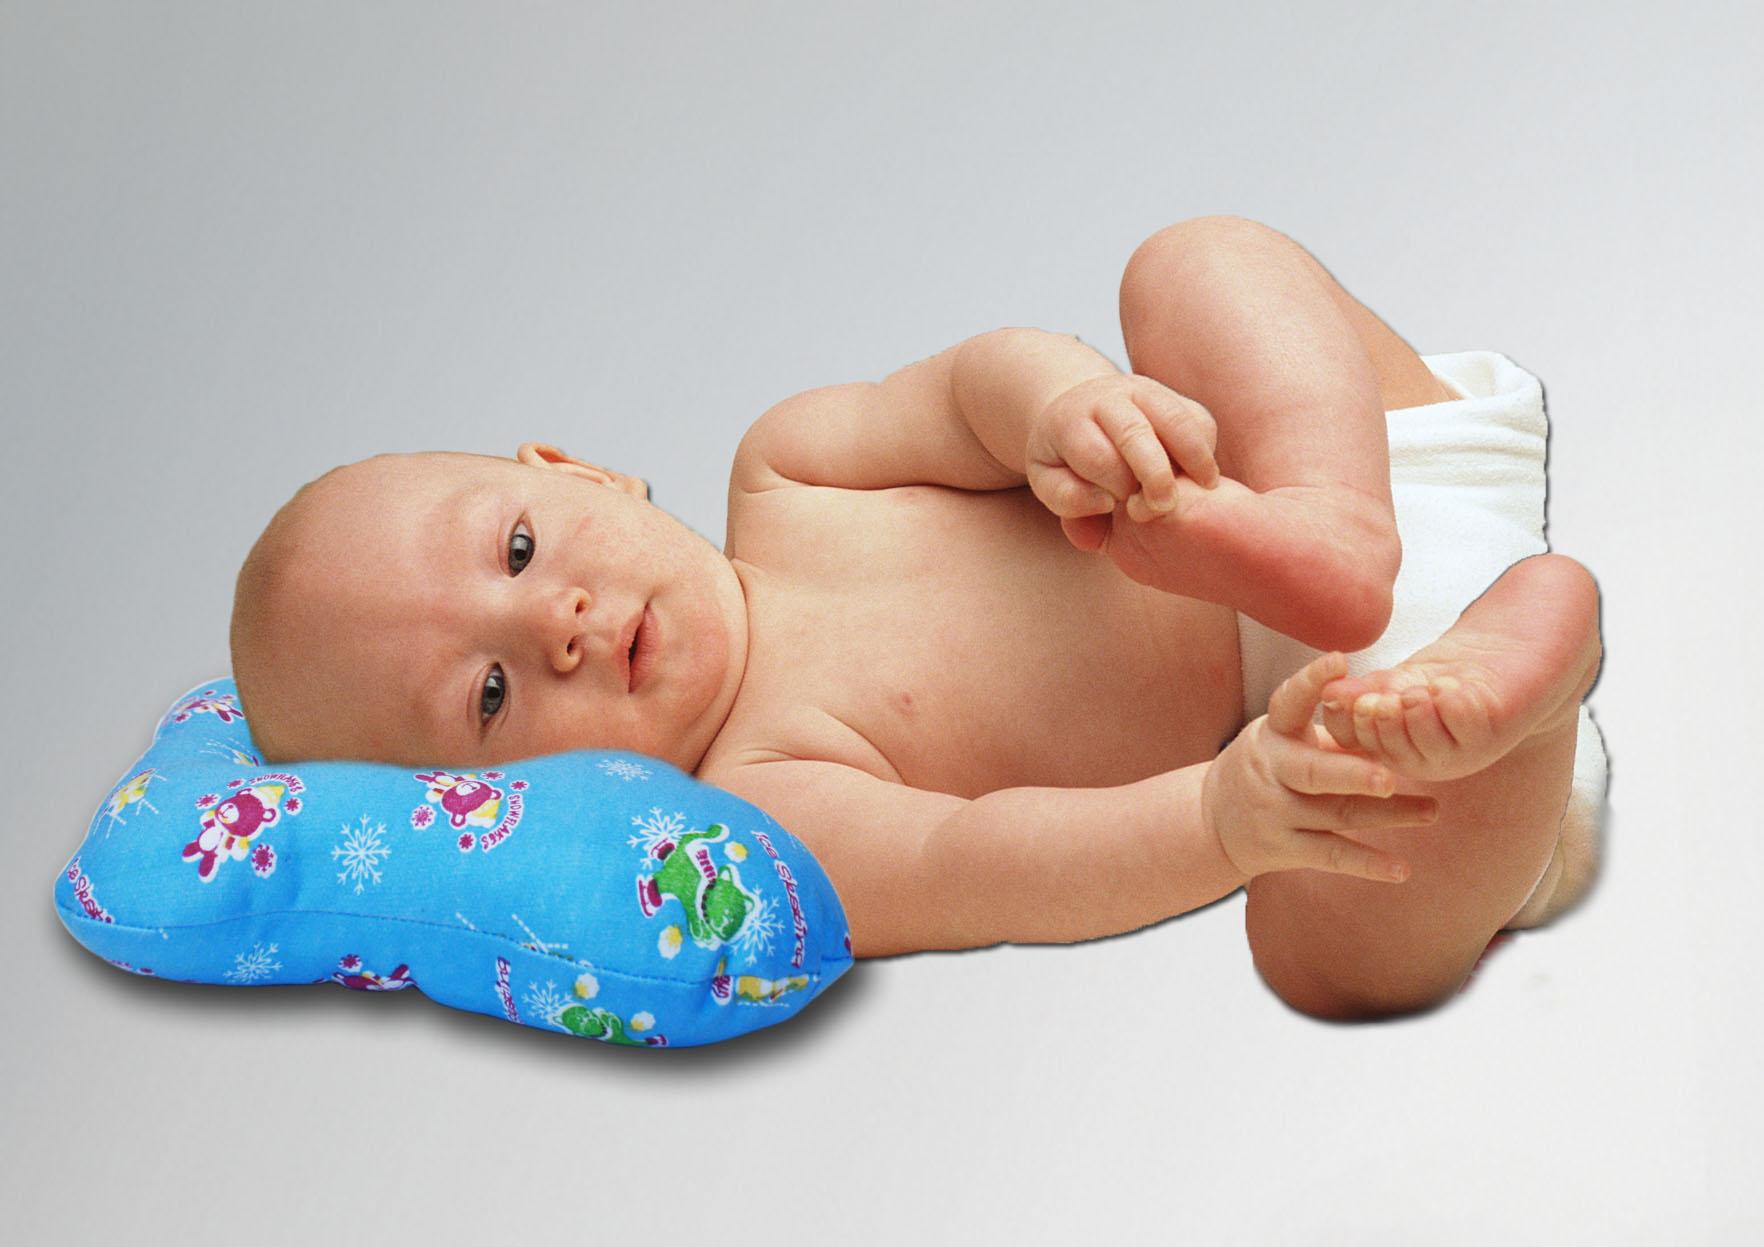 ребенок на ортопедической подушке фото